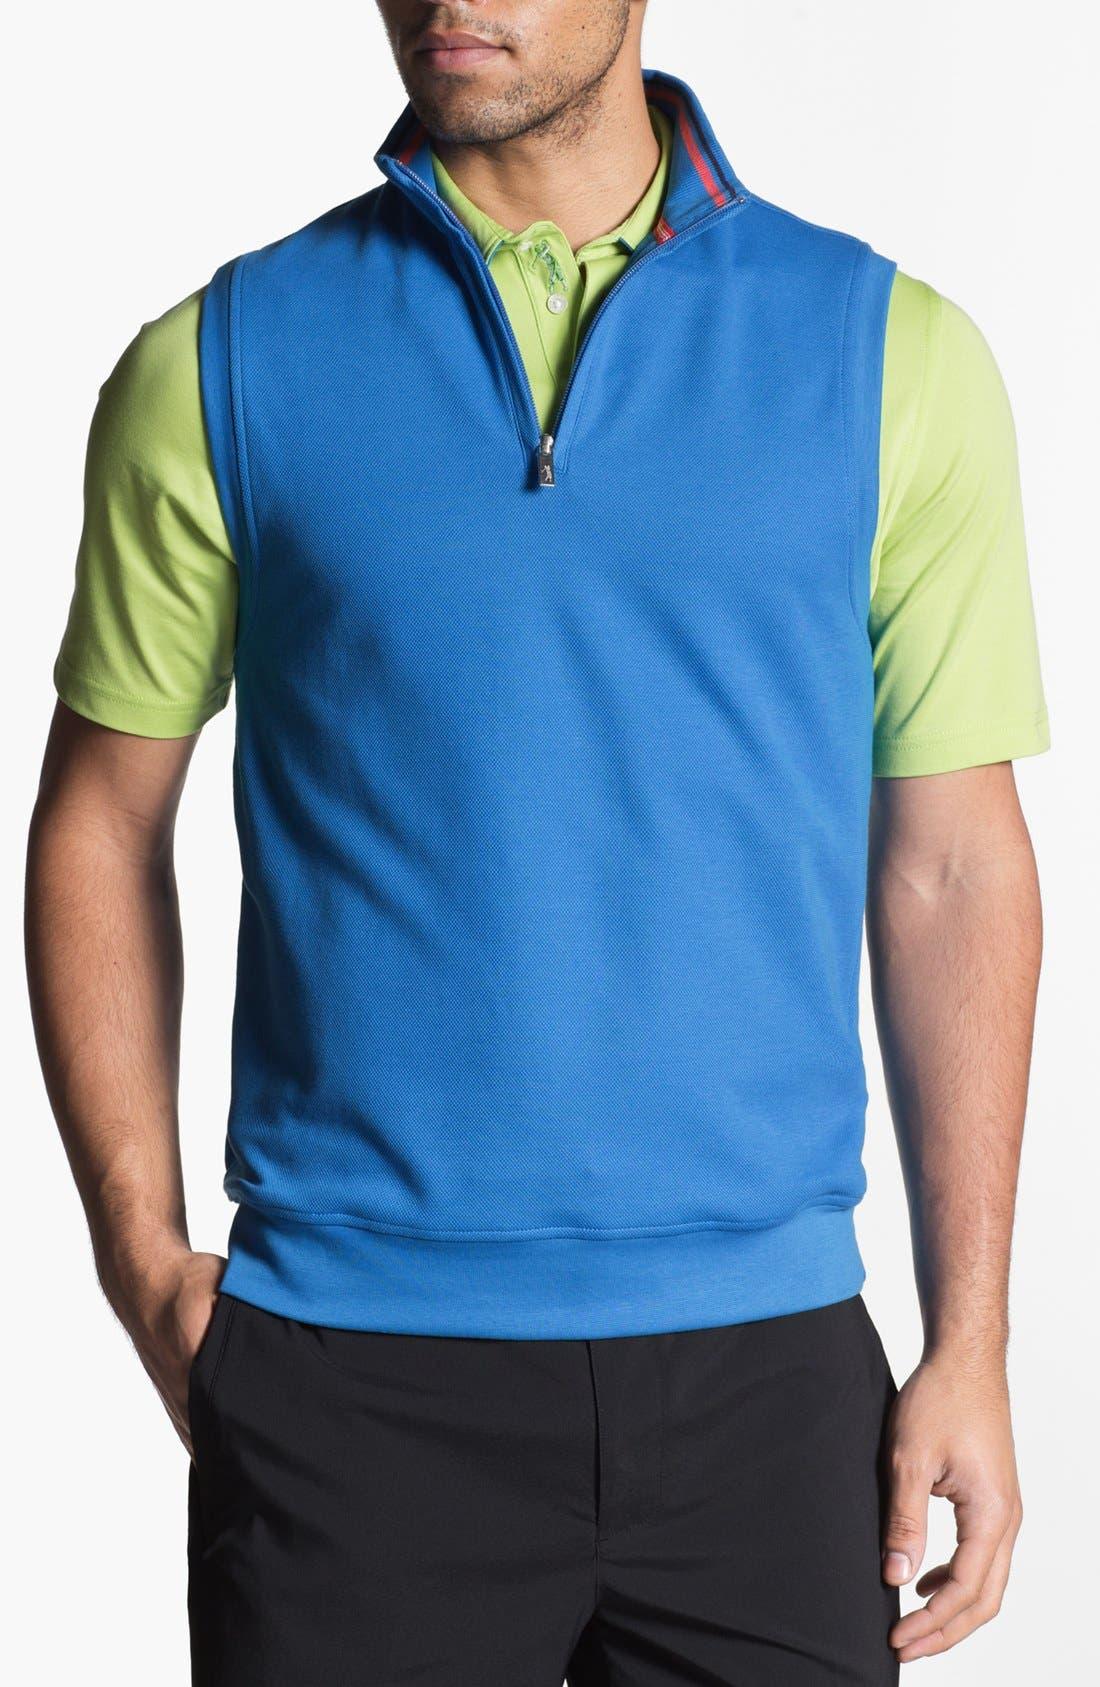 Alternate Image 1 Selected - Bobby Jones Quarter Zip Piqué Vest